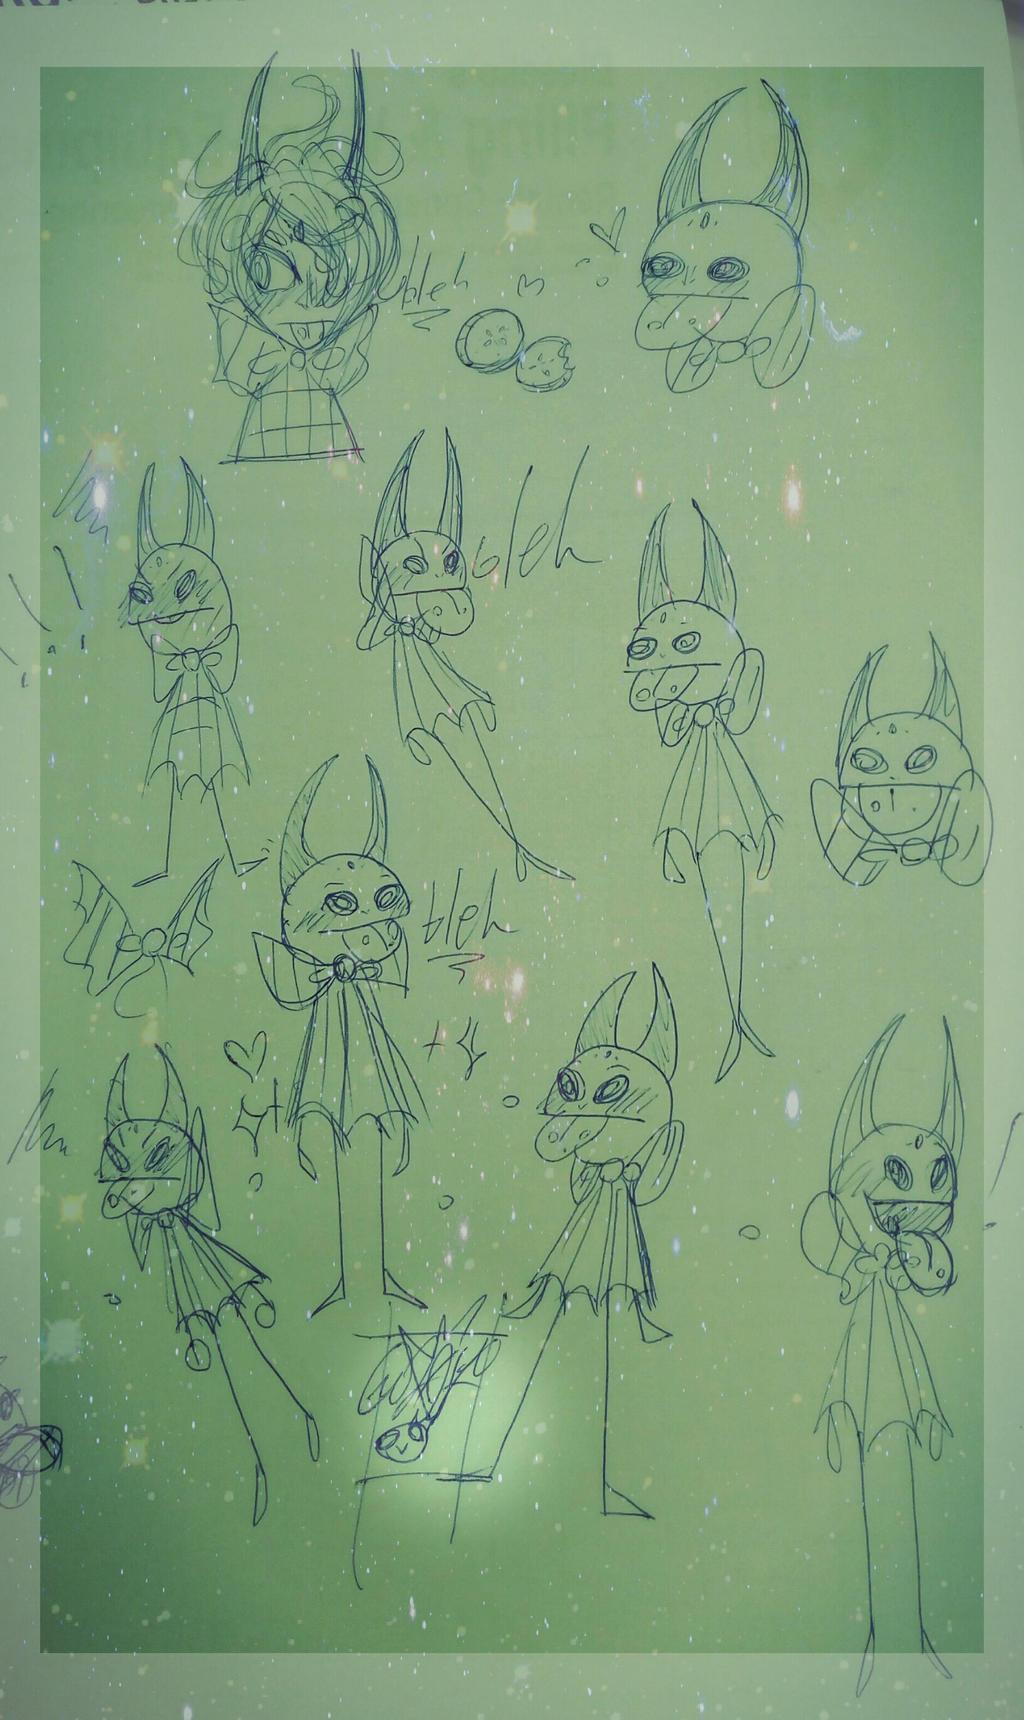 -bleh doodleshh- by MikuBlazeTheKat